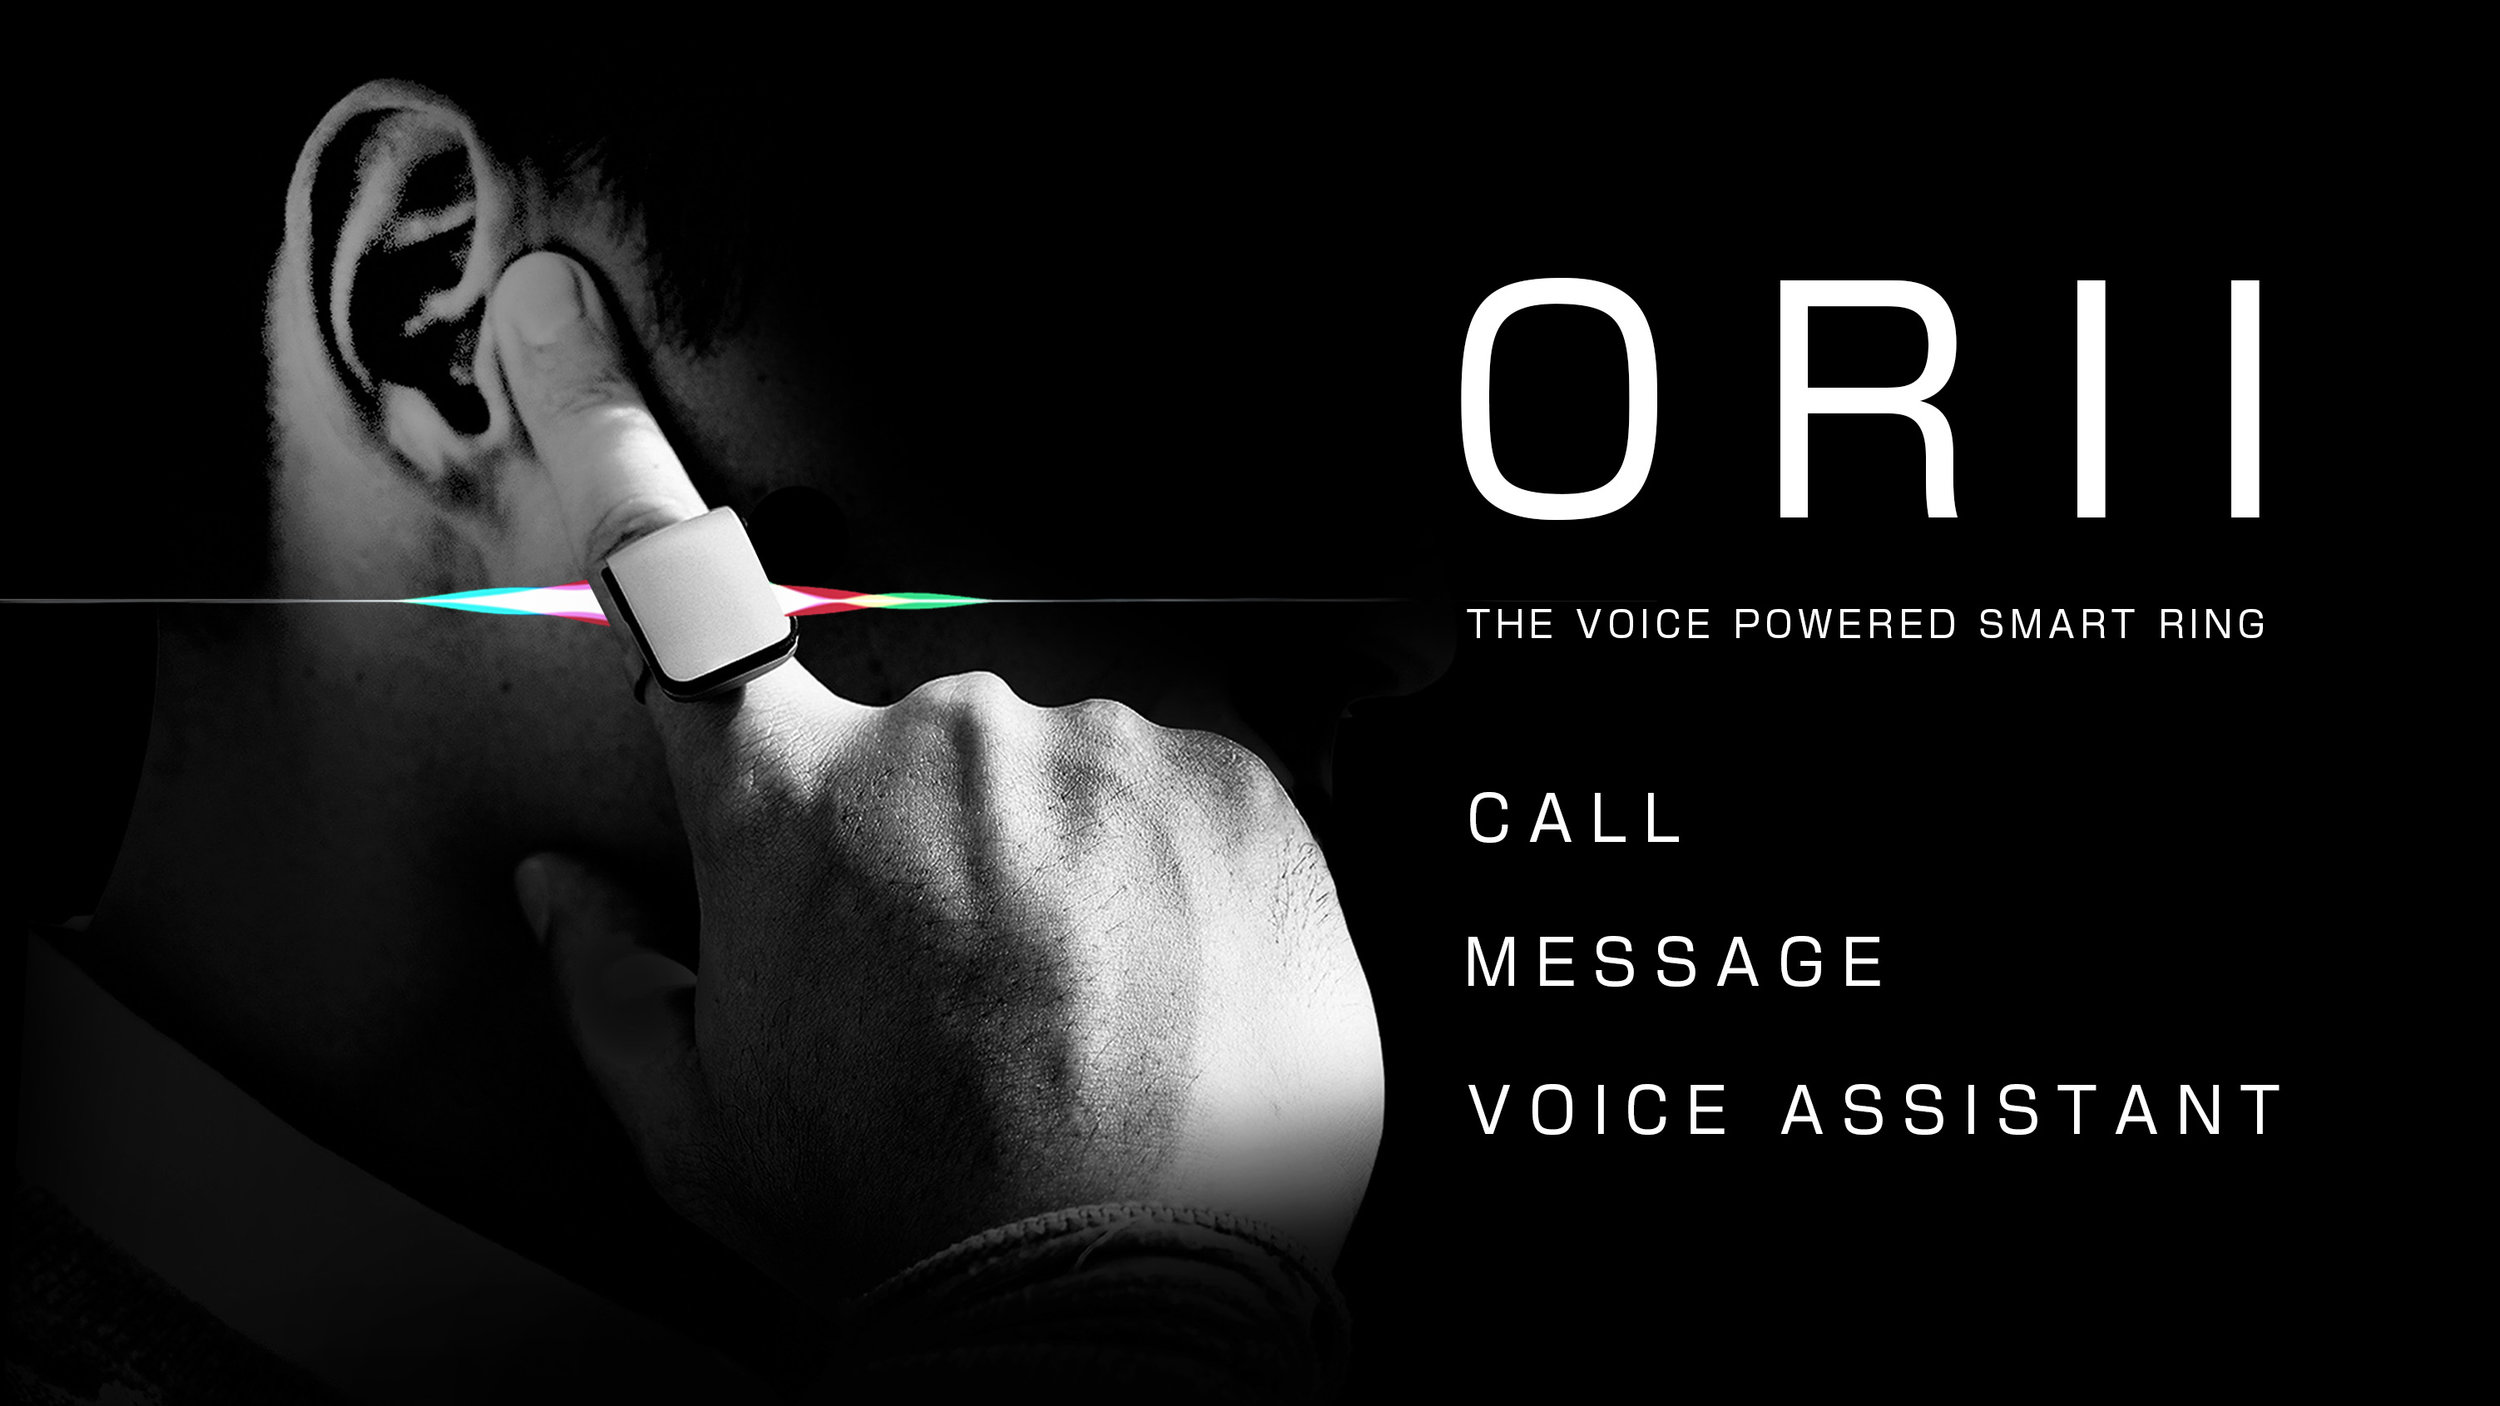 ORII-startup-product-image.jpg